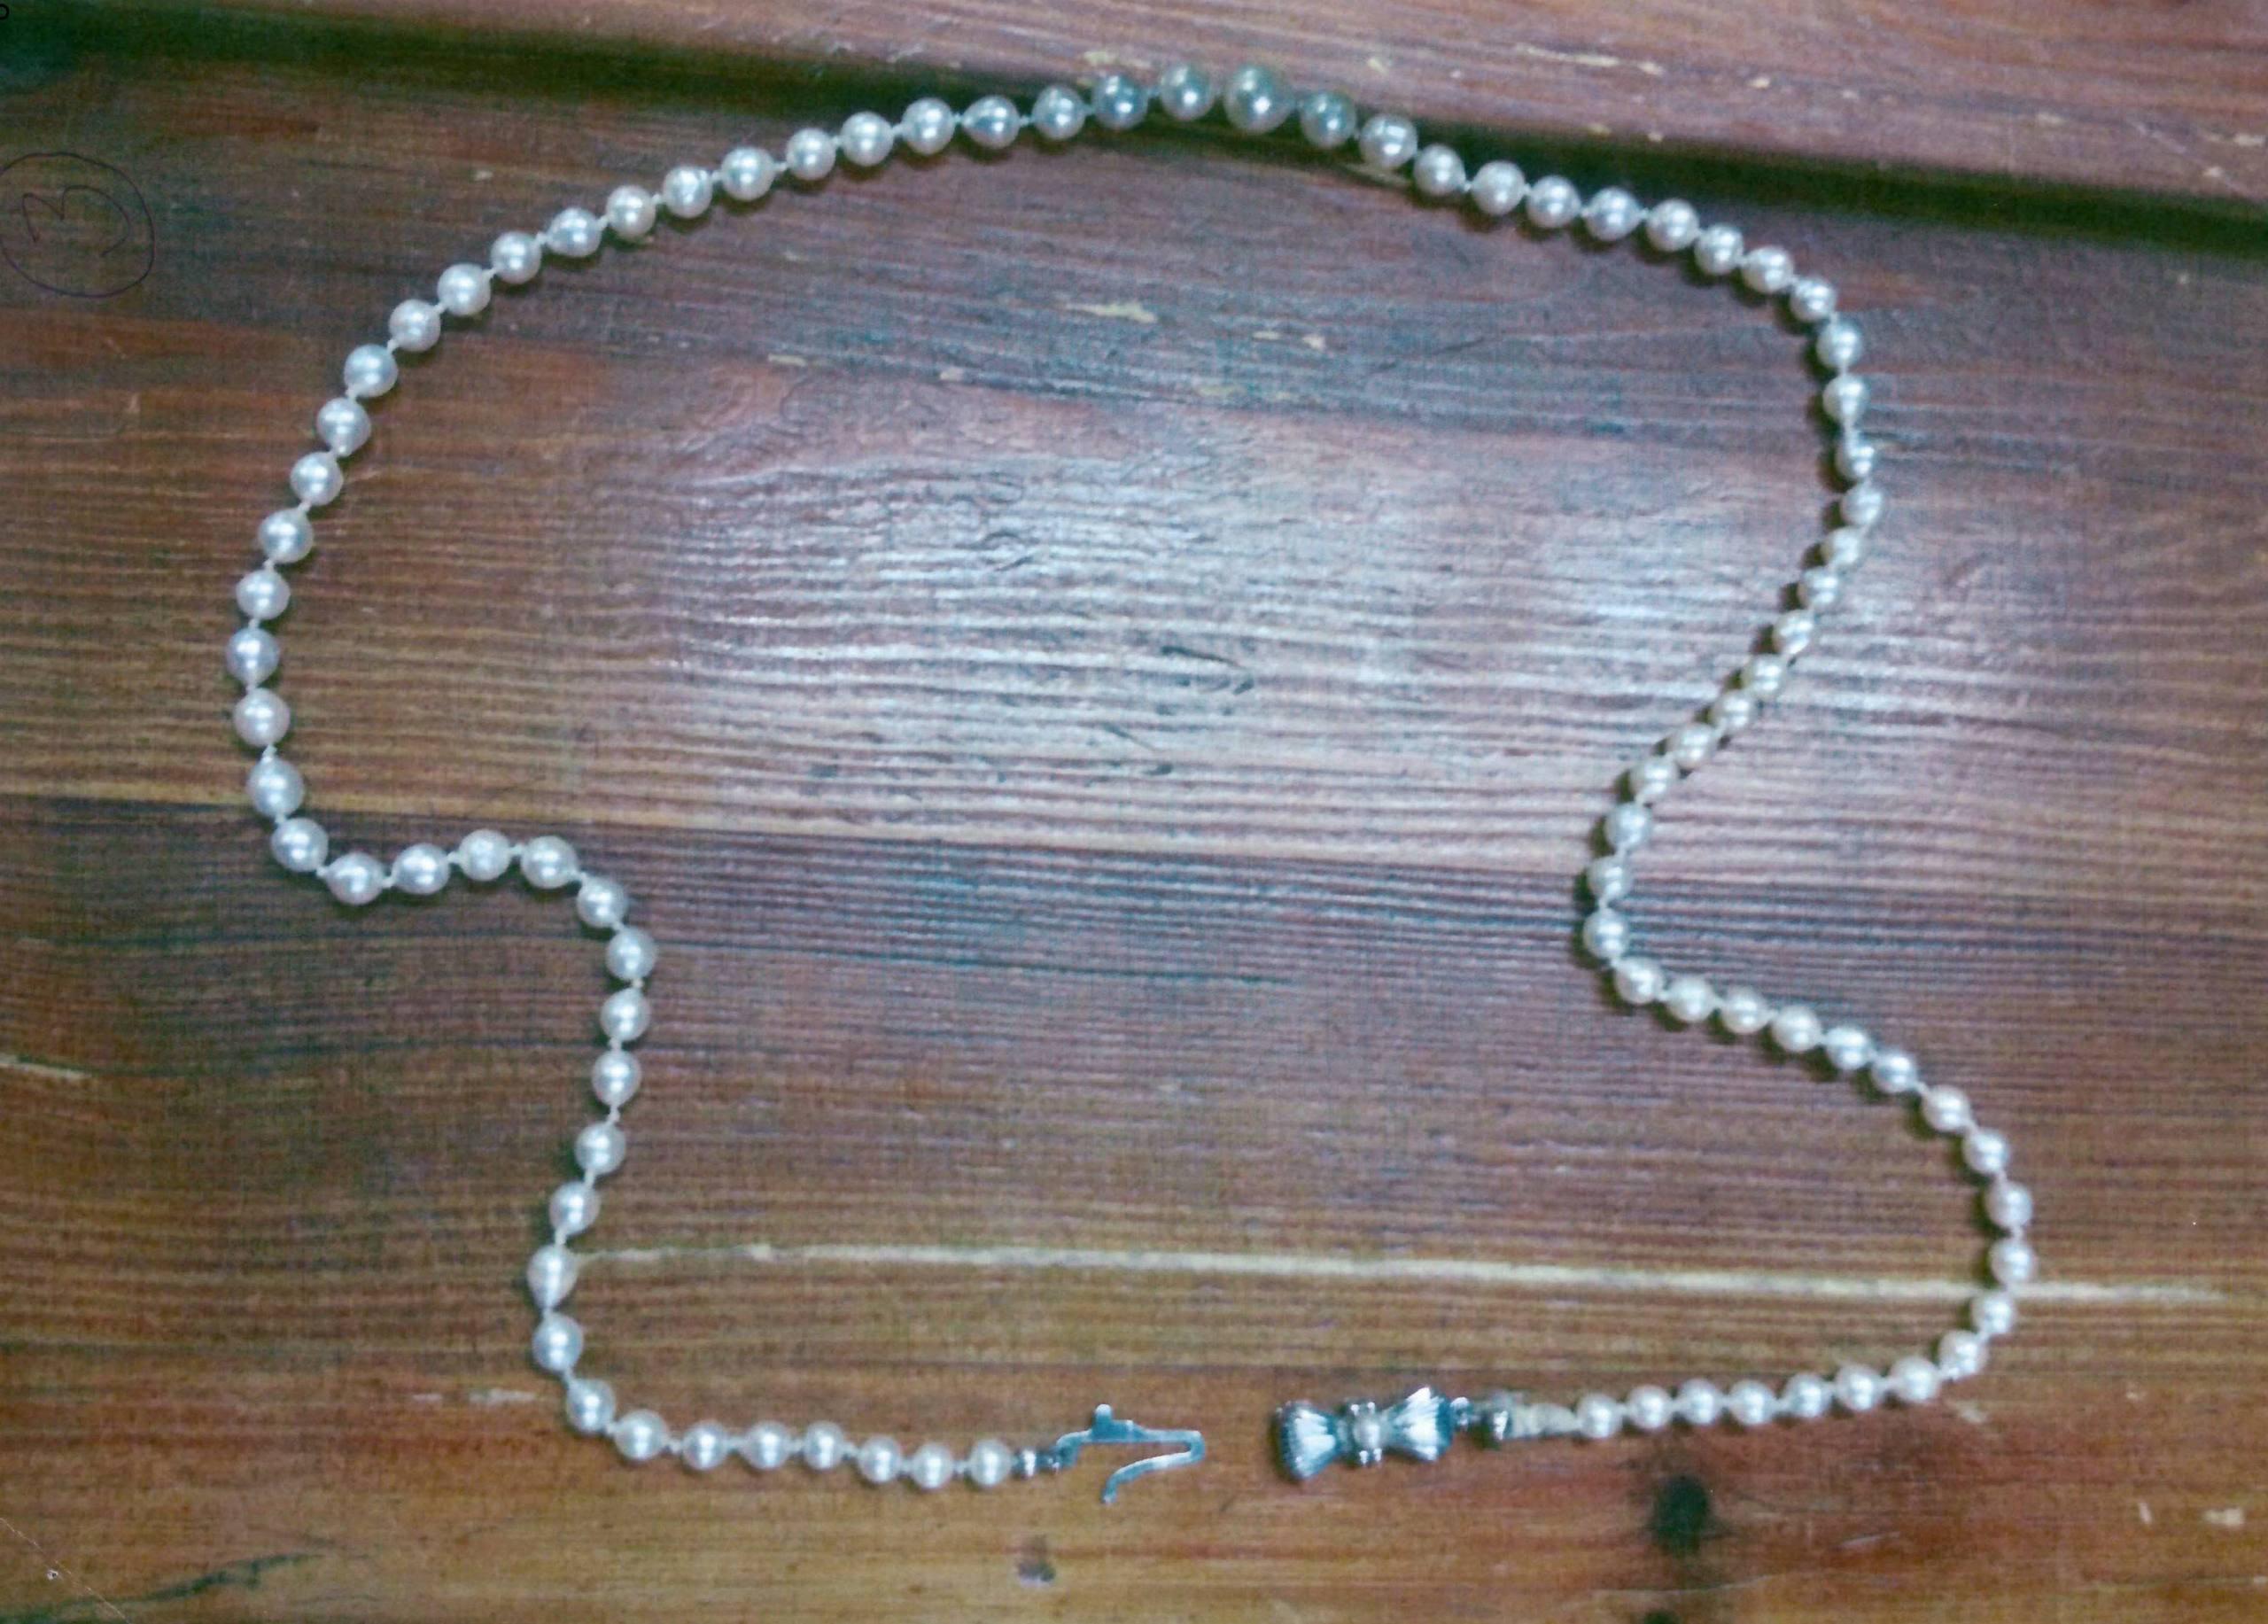 Polisen pantsatte grannens smycken